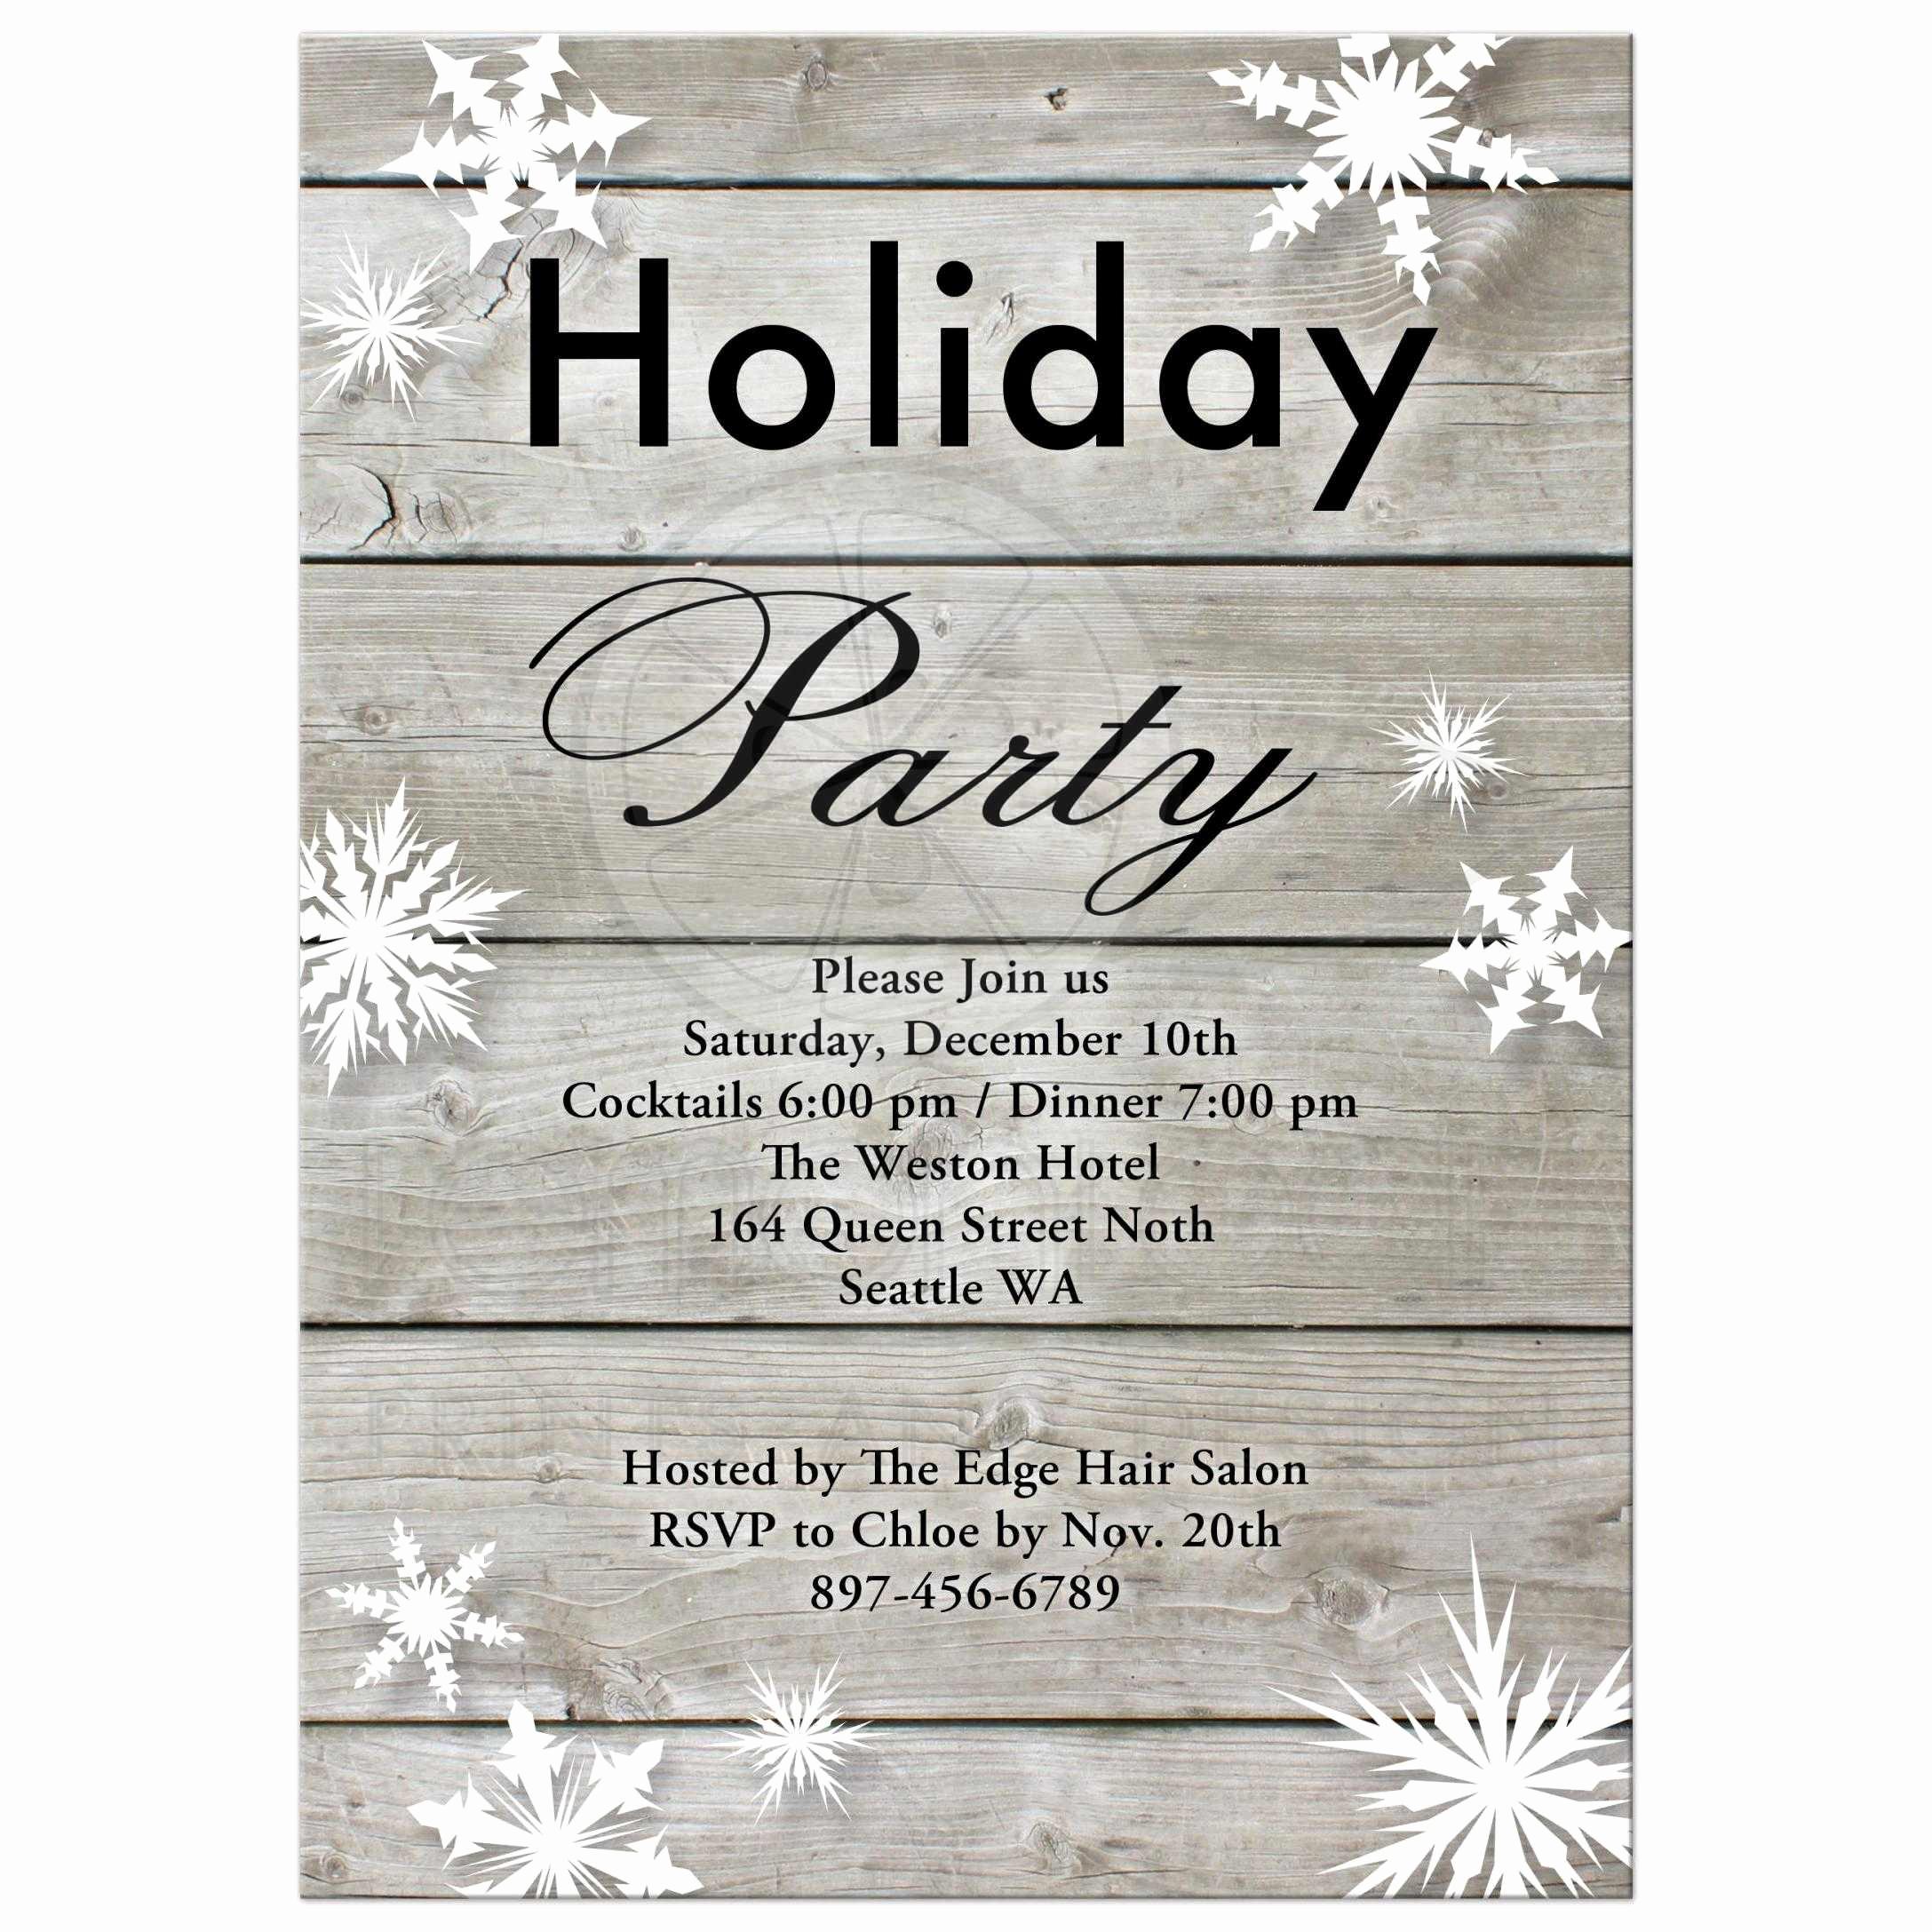 Company Holiday Party Invitation Unique Corporate Holiday Party Invitation On Barn Board